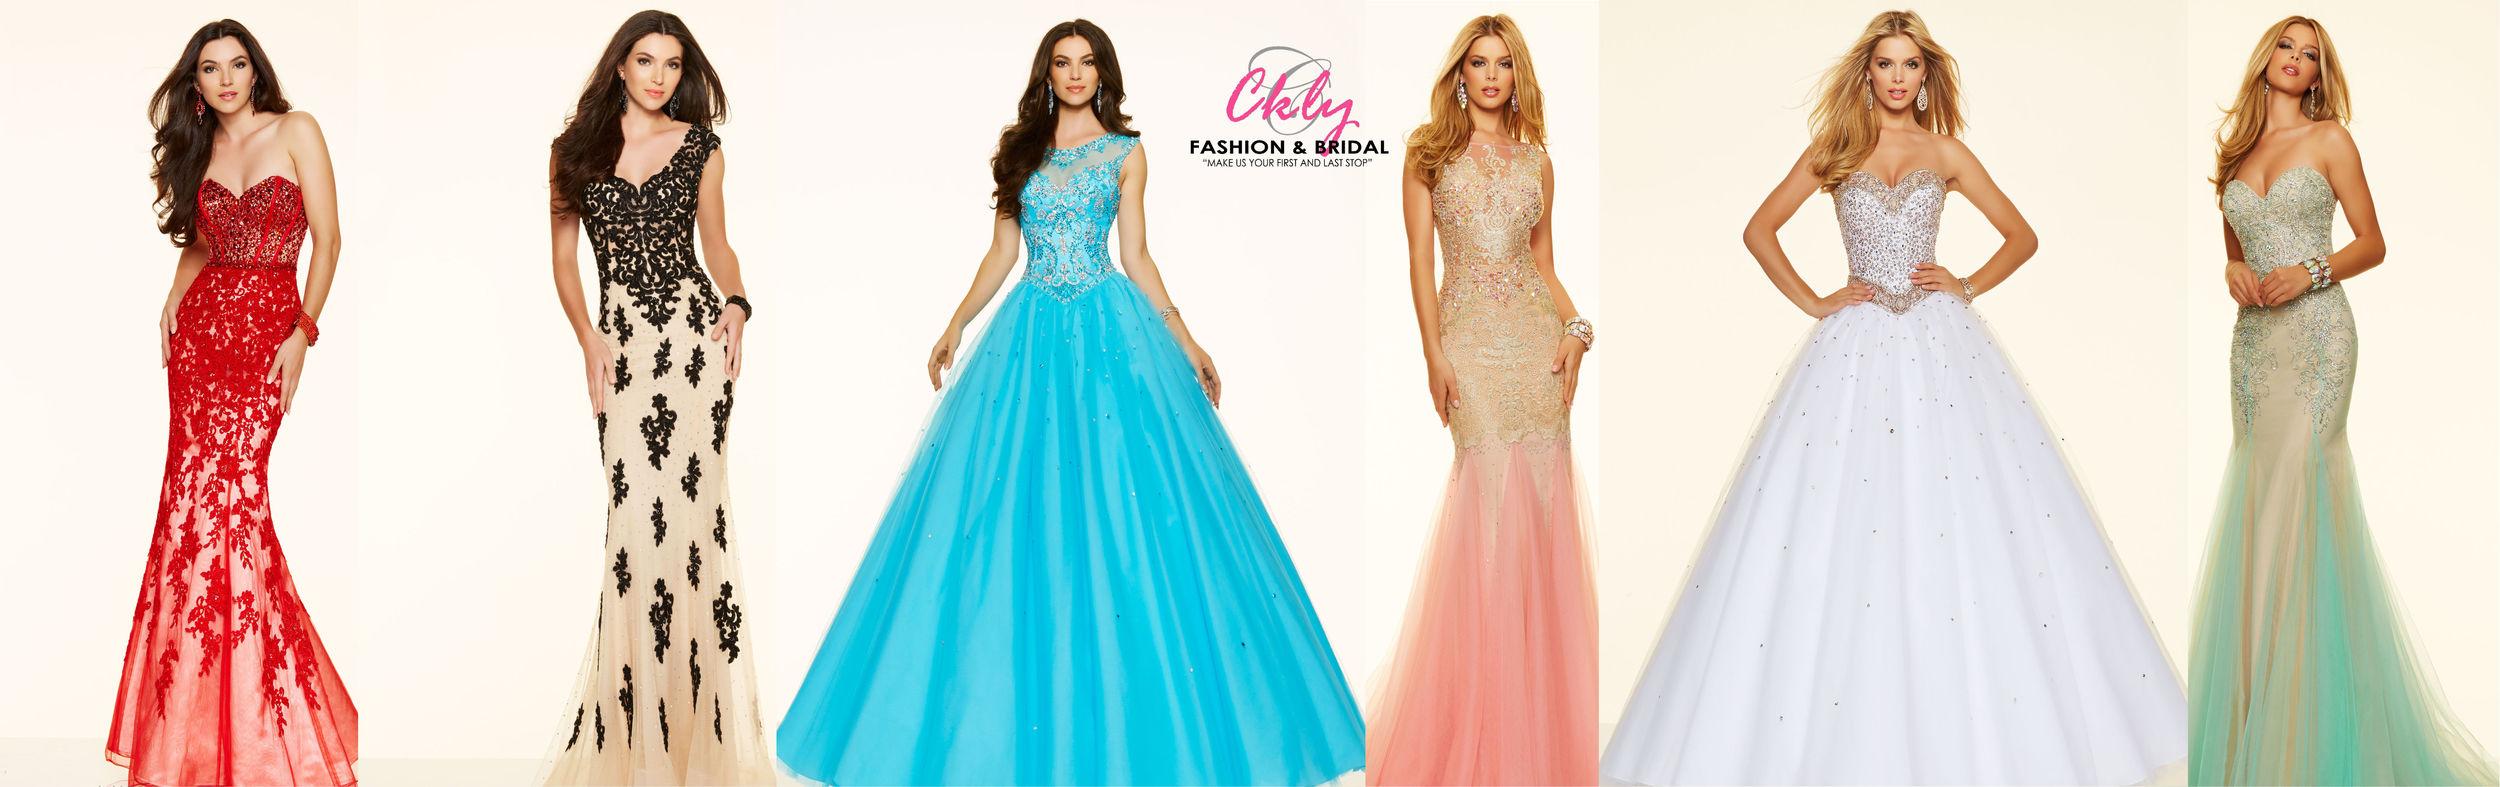 Großzügig Prom Kleider Winnipeg Ideen - Brautkleider Ideen ...